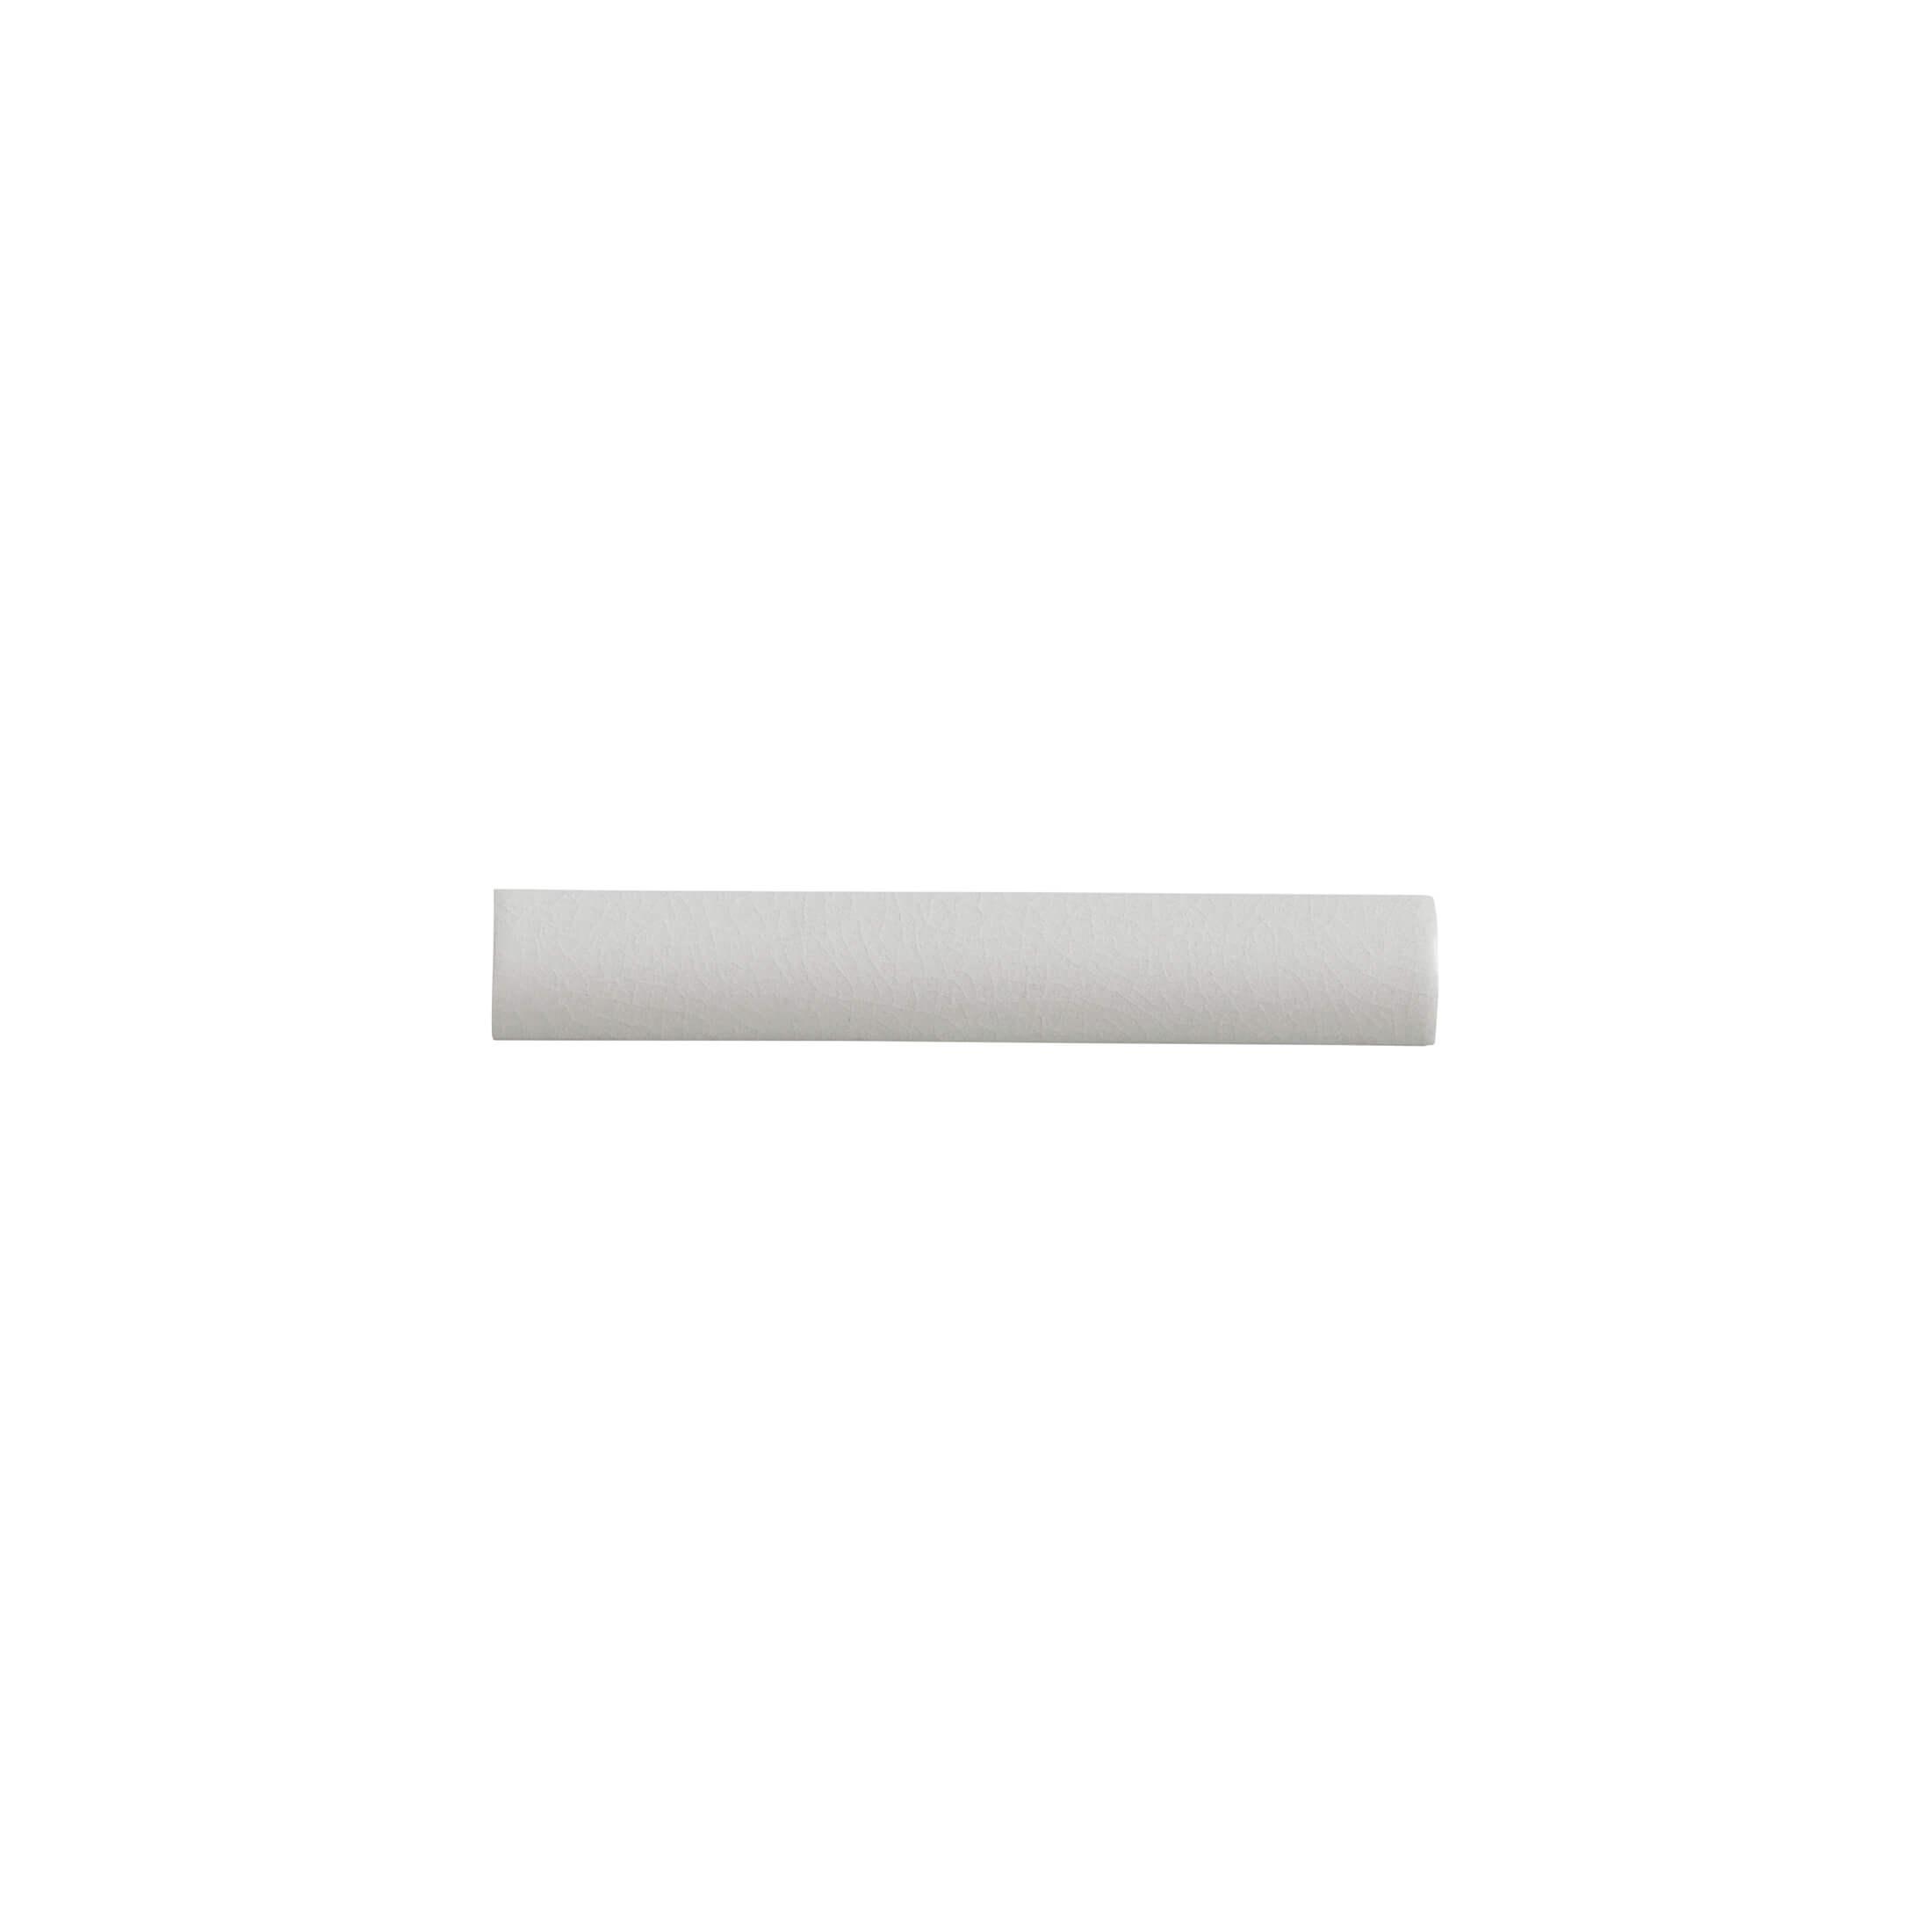 ADEH5054 - CUBRECANTO  - 2.5 cm X 15 cm